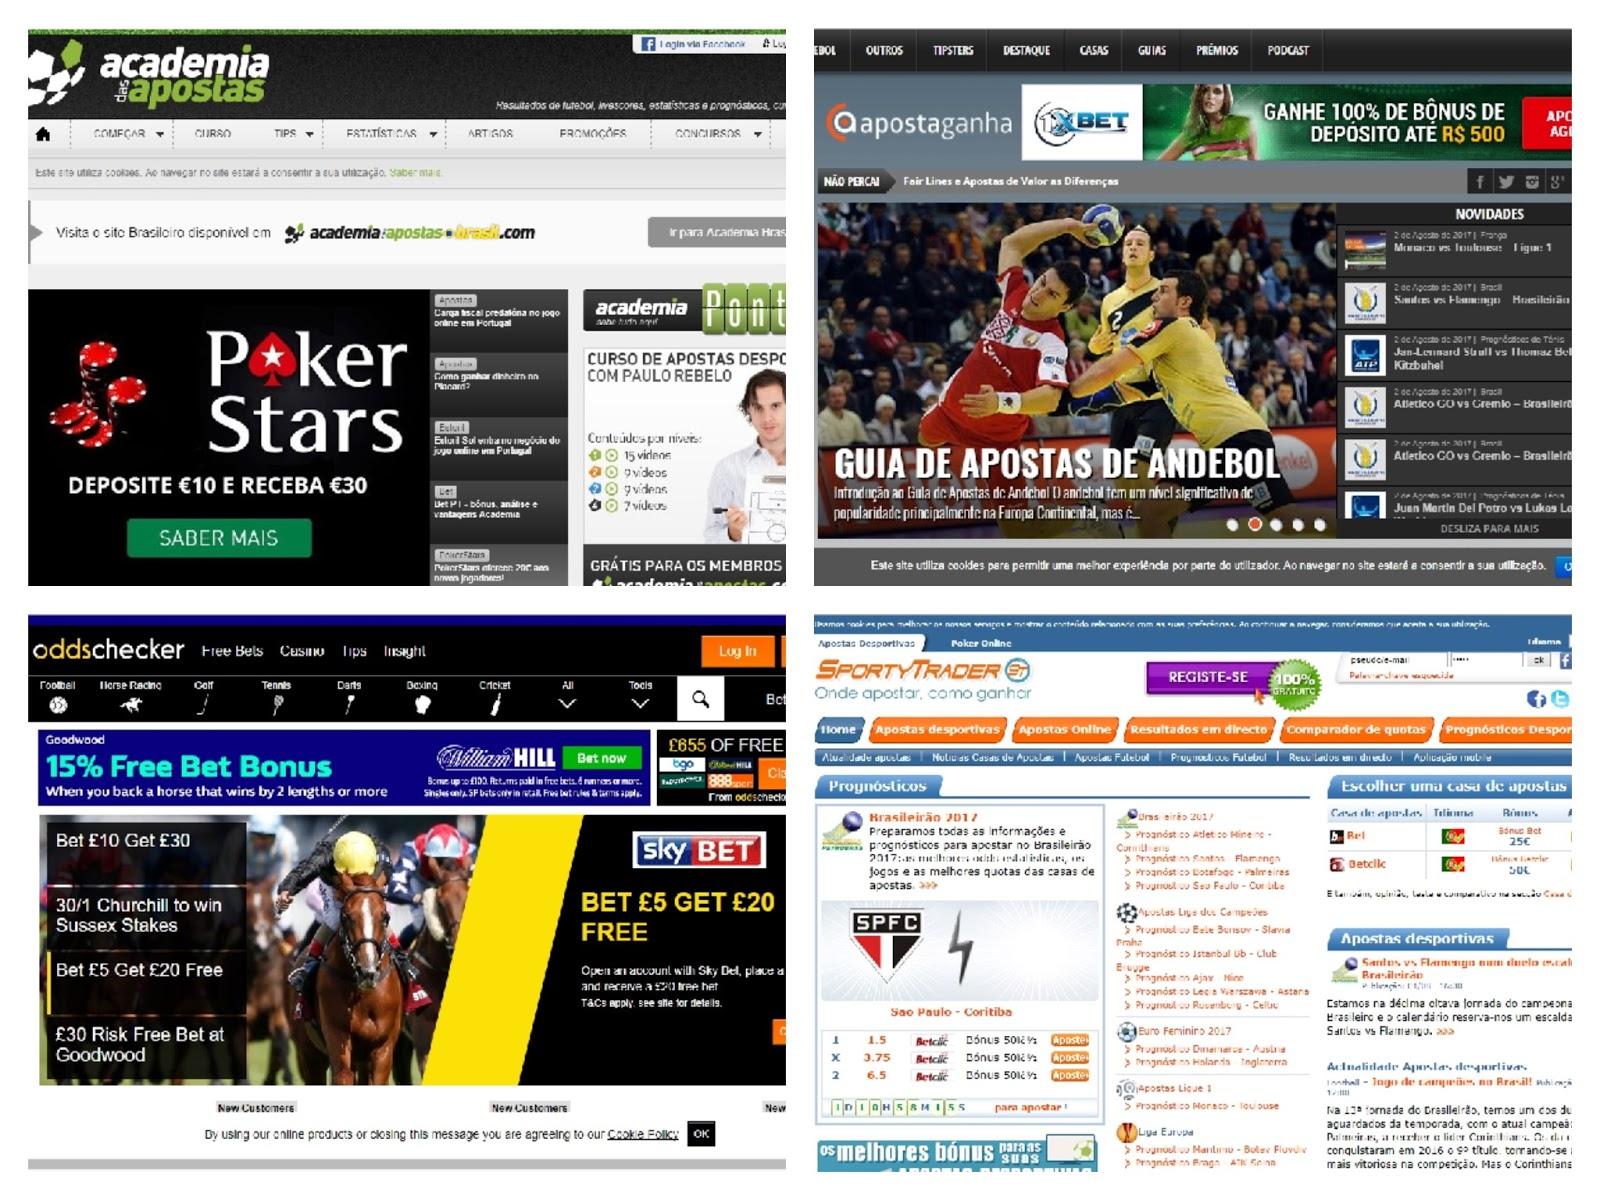 Aprender a fazer apostas desportivas